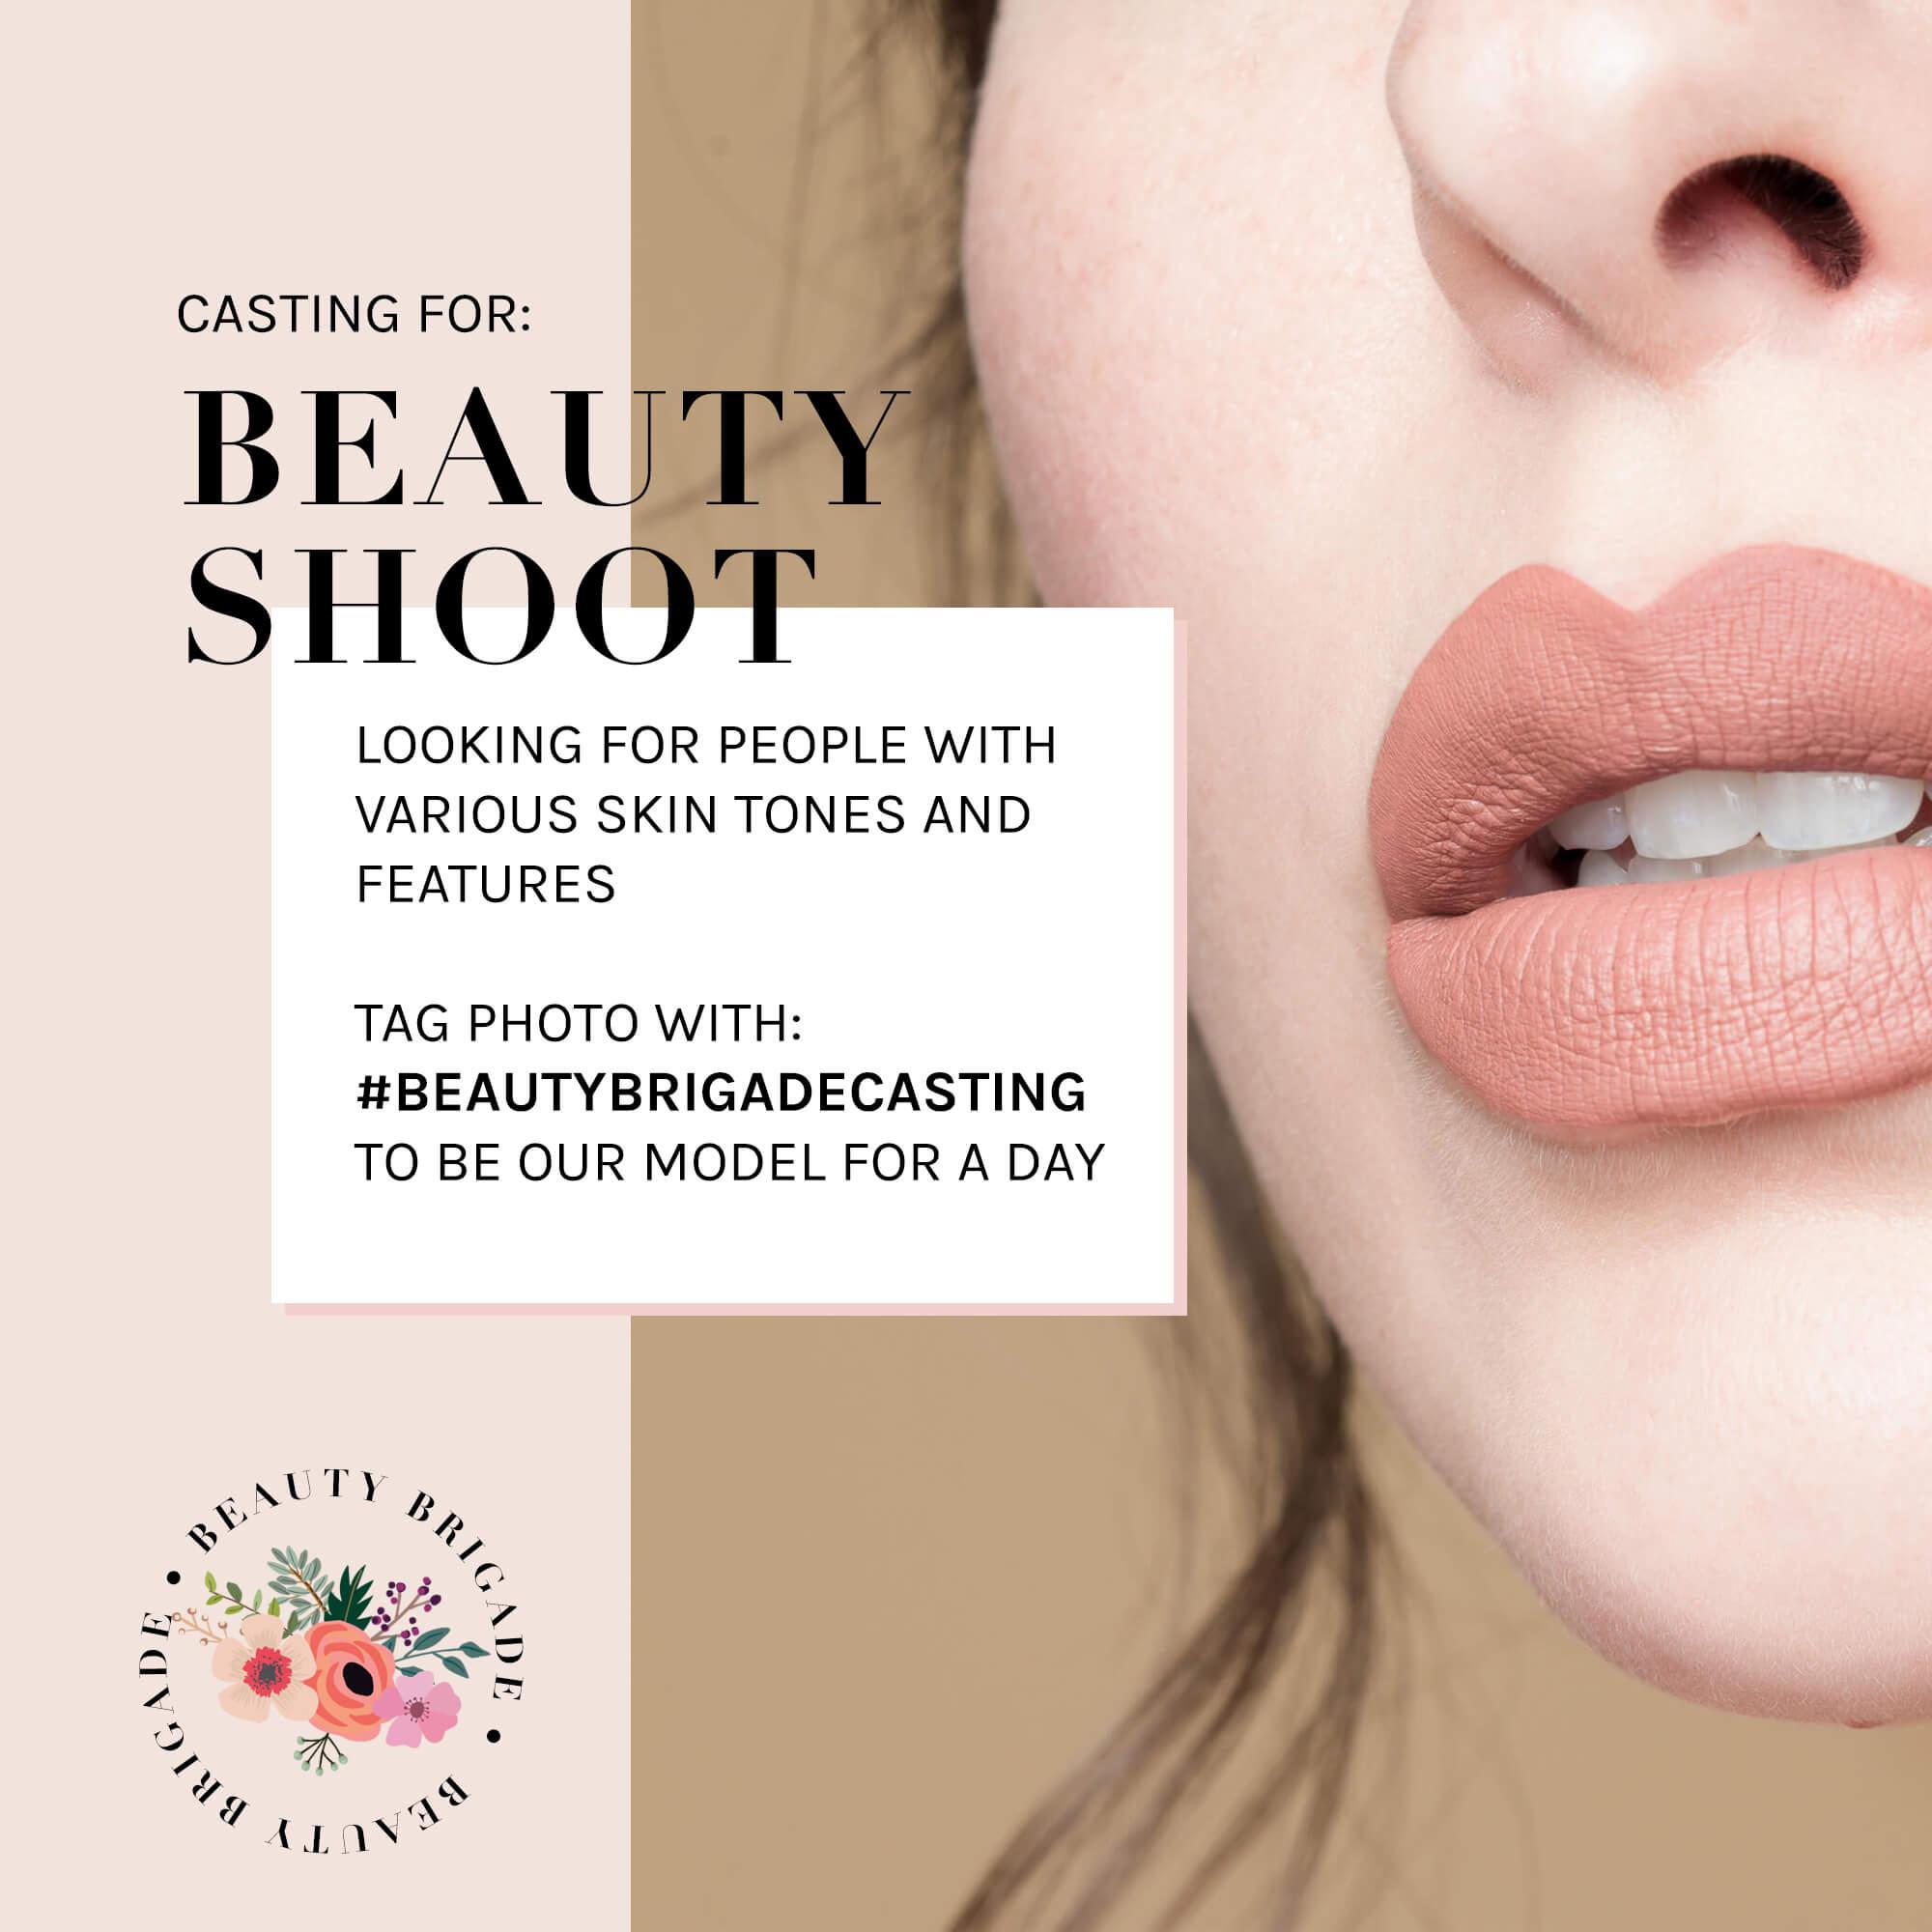 beauty brigade by keiko lynn